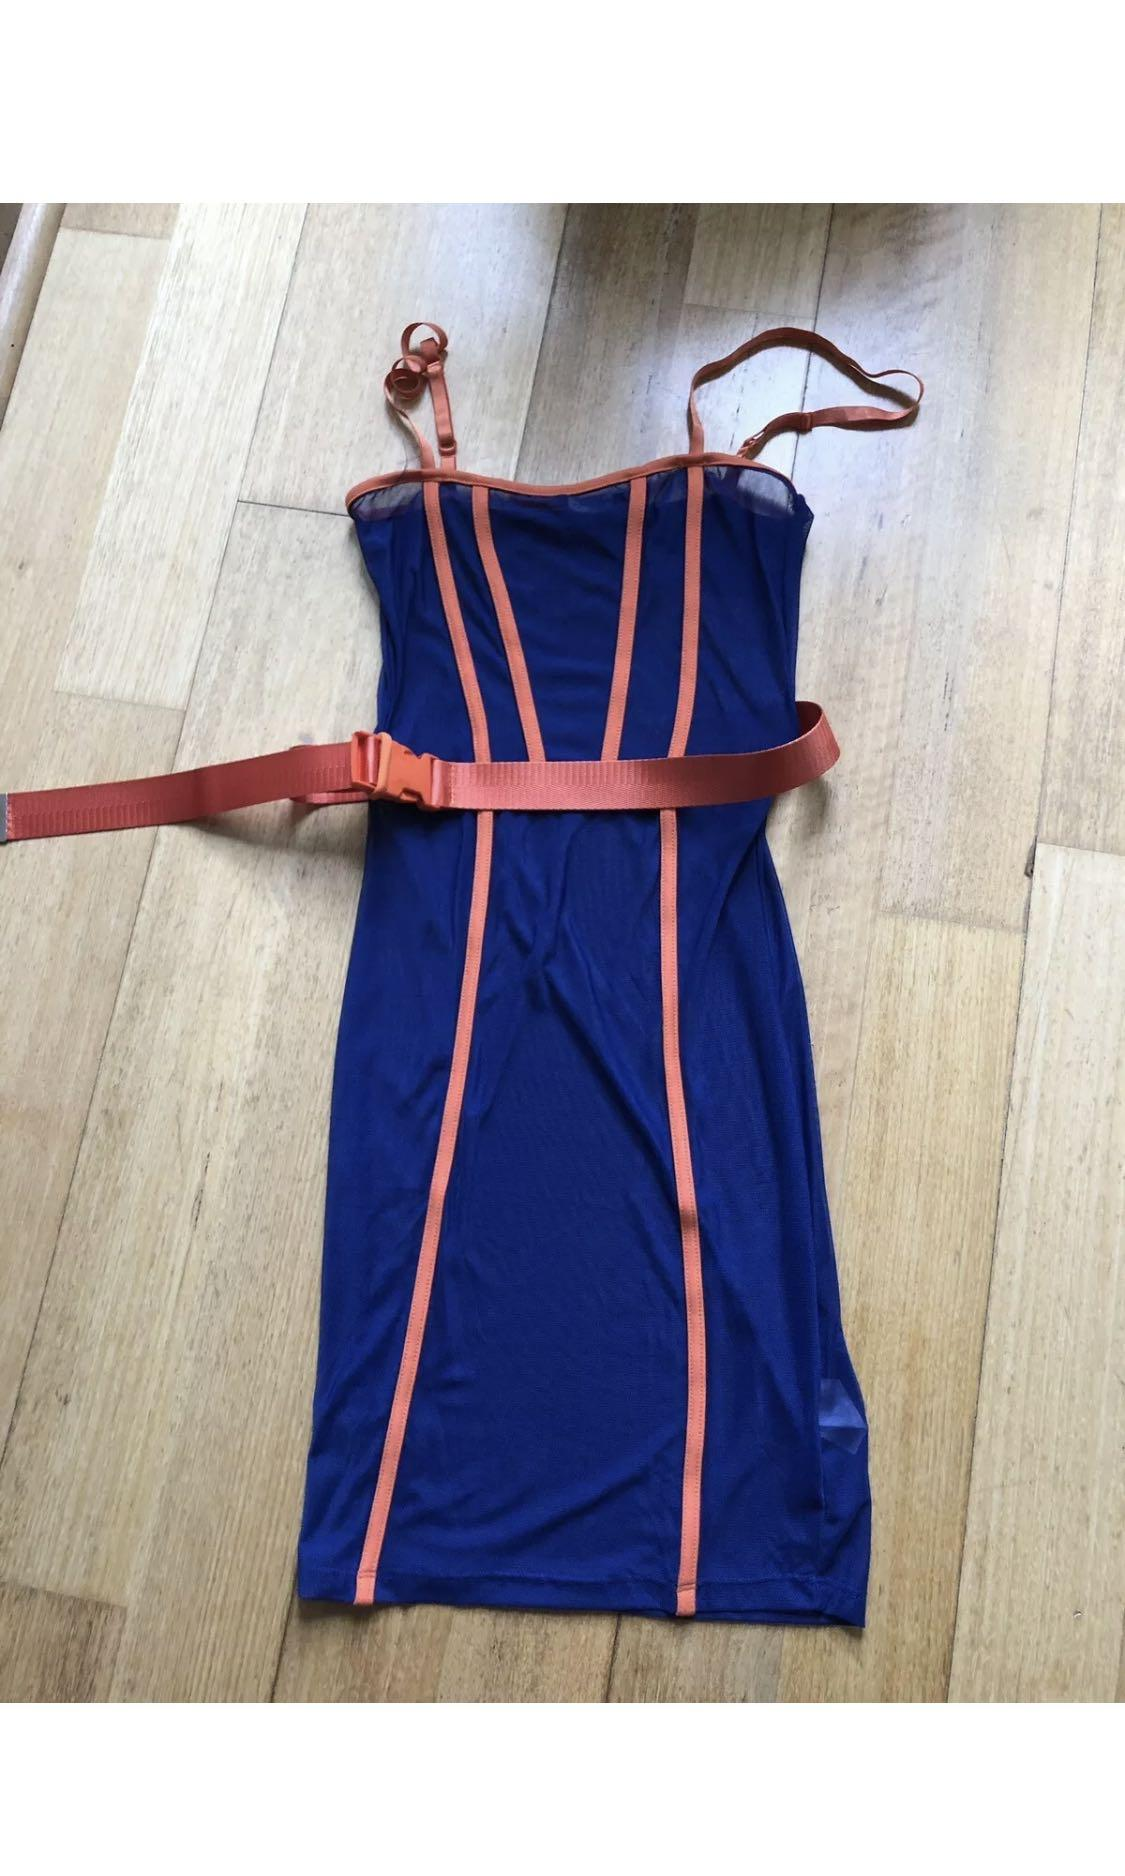 NEW TIGERMIST REVOLVE KARDASHIAN MESH DRESS WITH BODYSUIT S